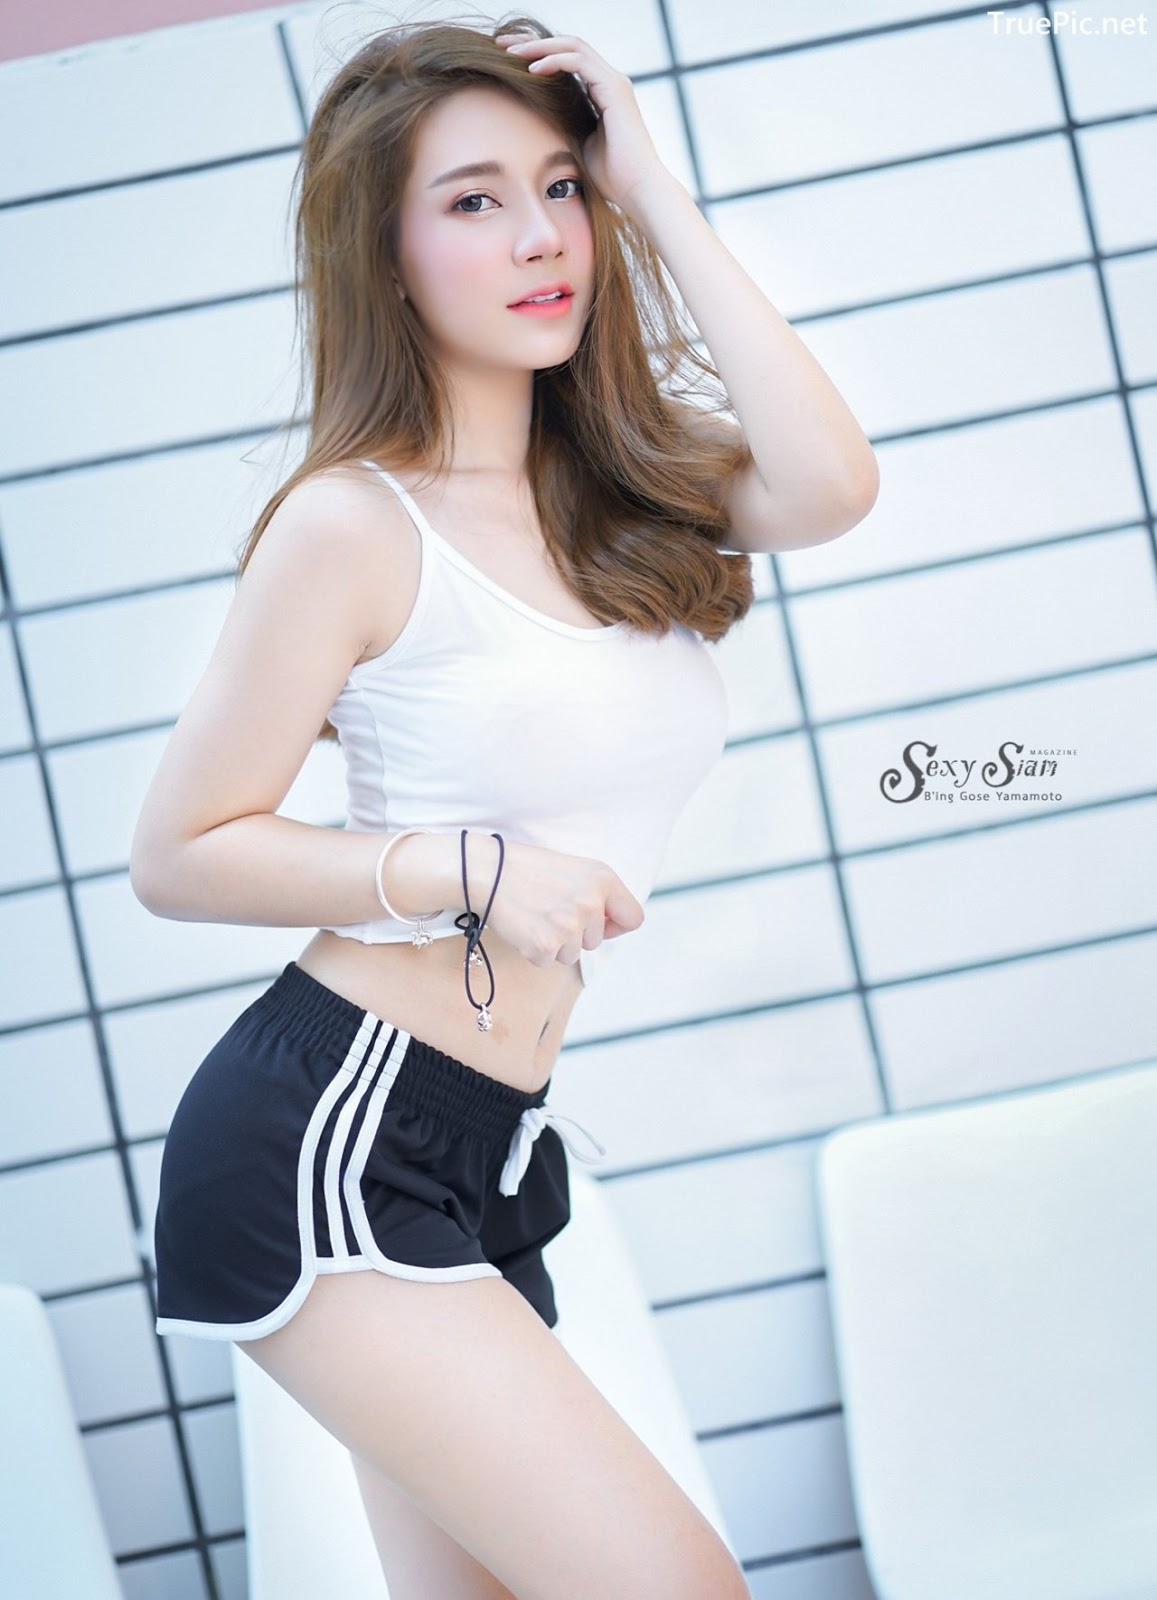 Image Thailand Model - Sasipa Tungmay Jibkrapong - White Crop Top - TruePic.net - Picture-4